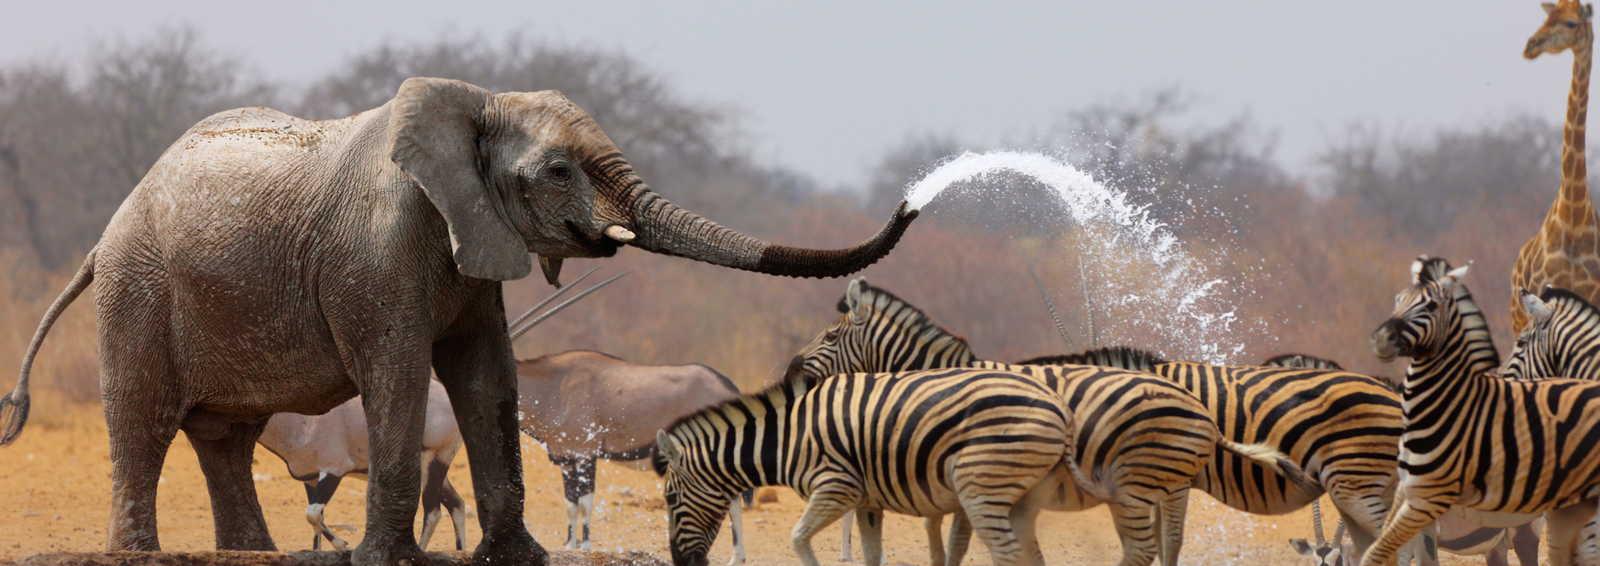 Elephant splashing water around